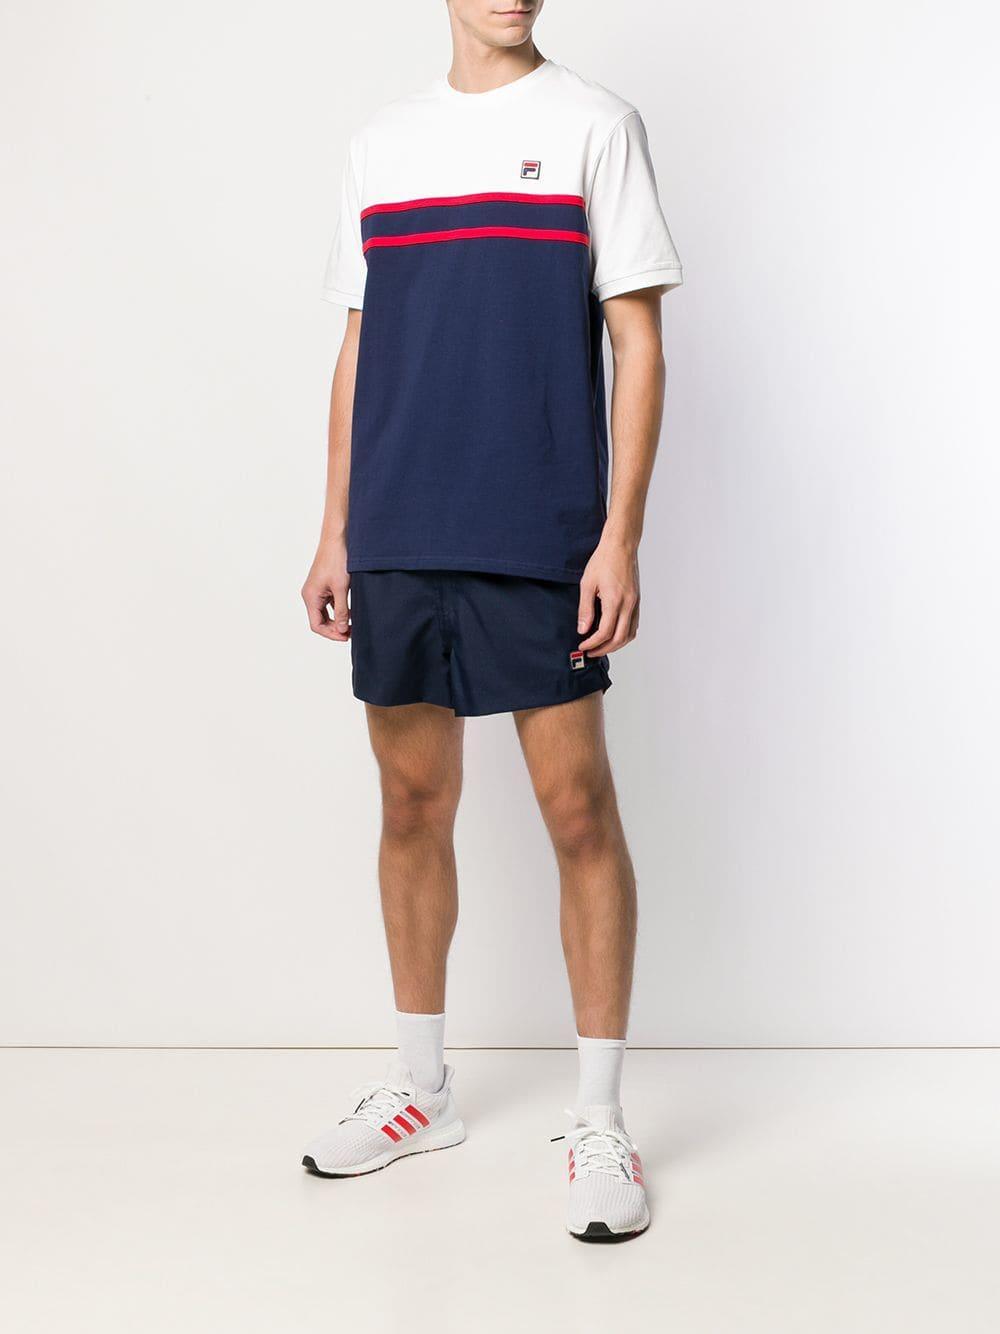 503f6ffffdbc9 Fila Patch Detailed Deck Shorts in Blue for Men - Lyst